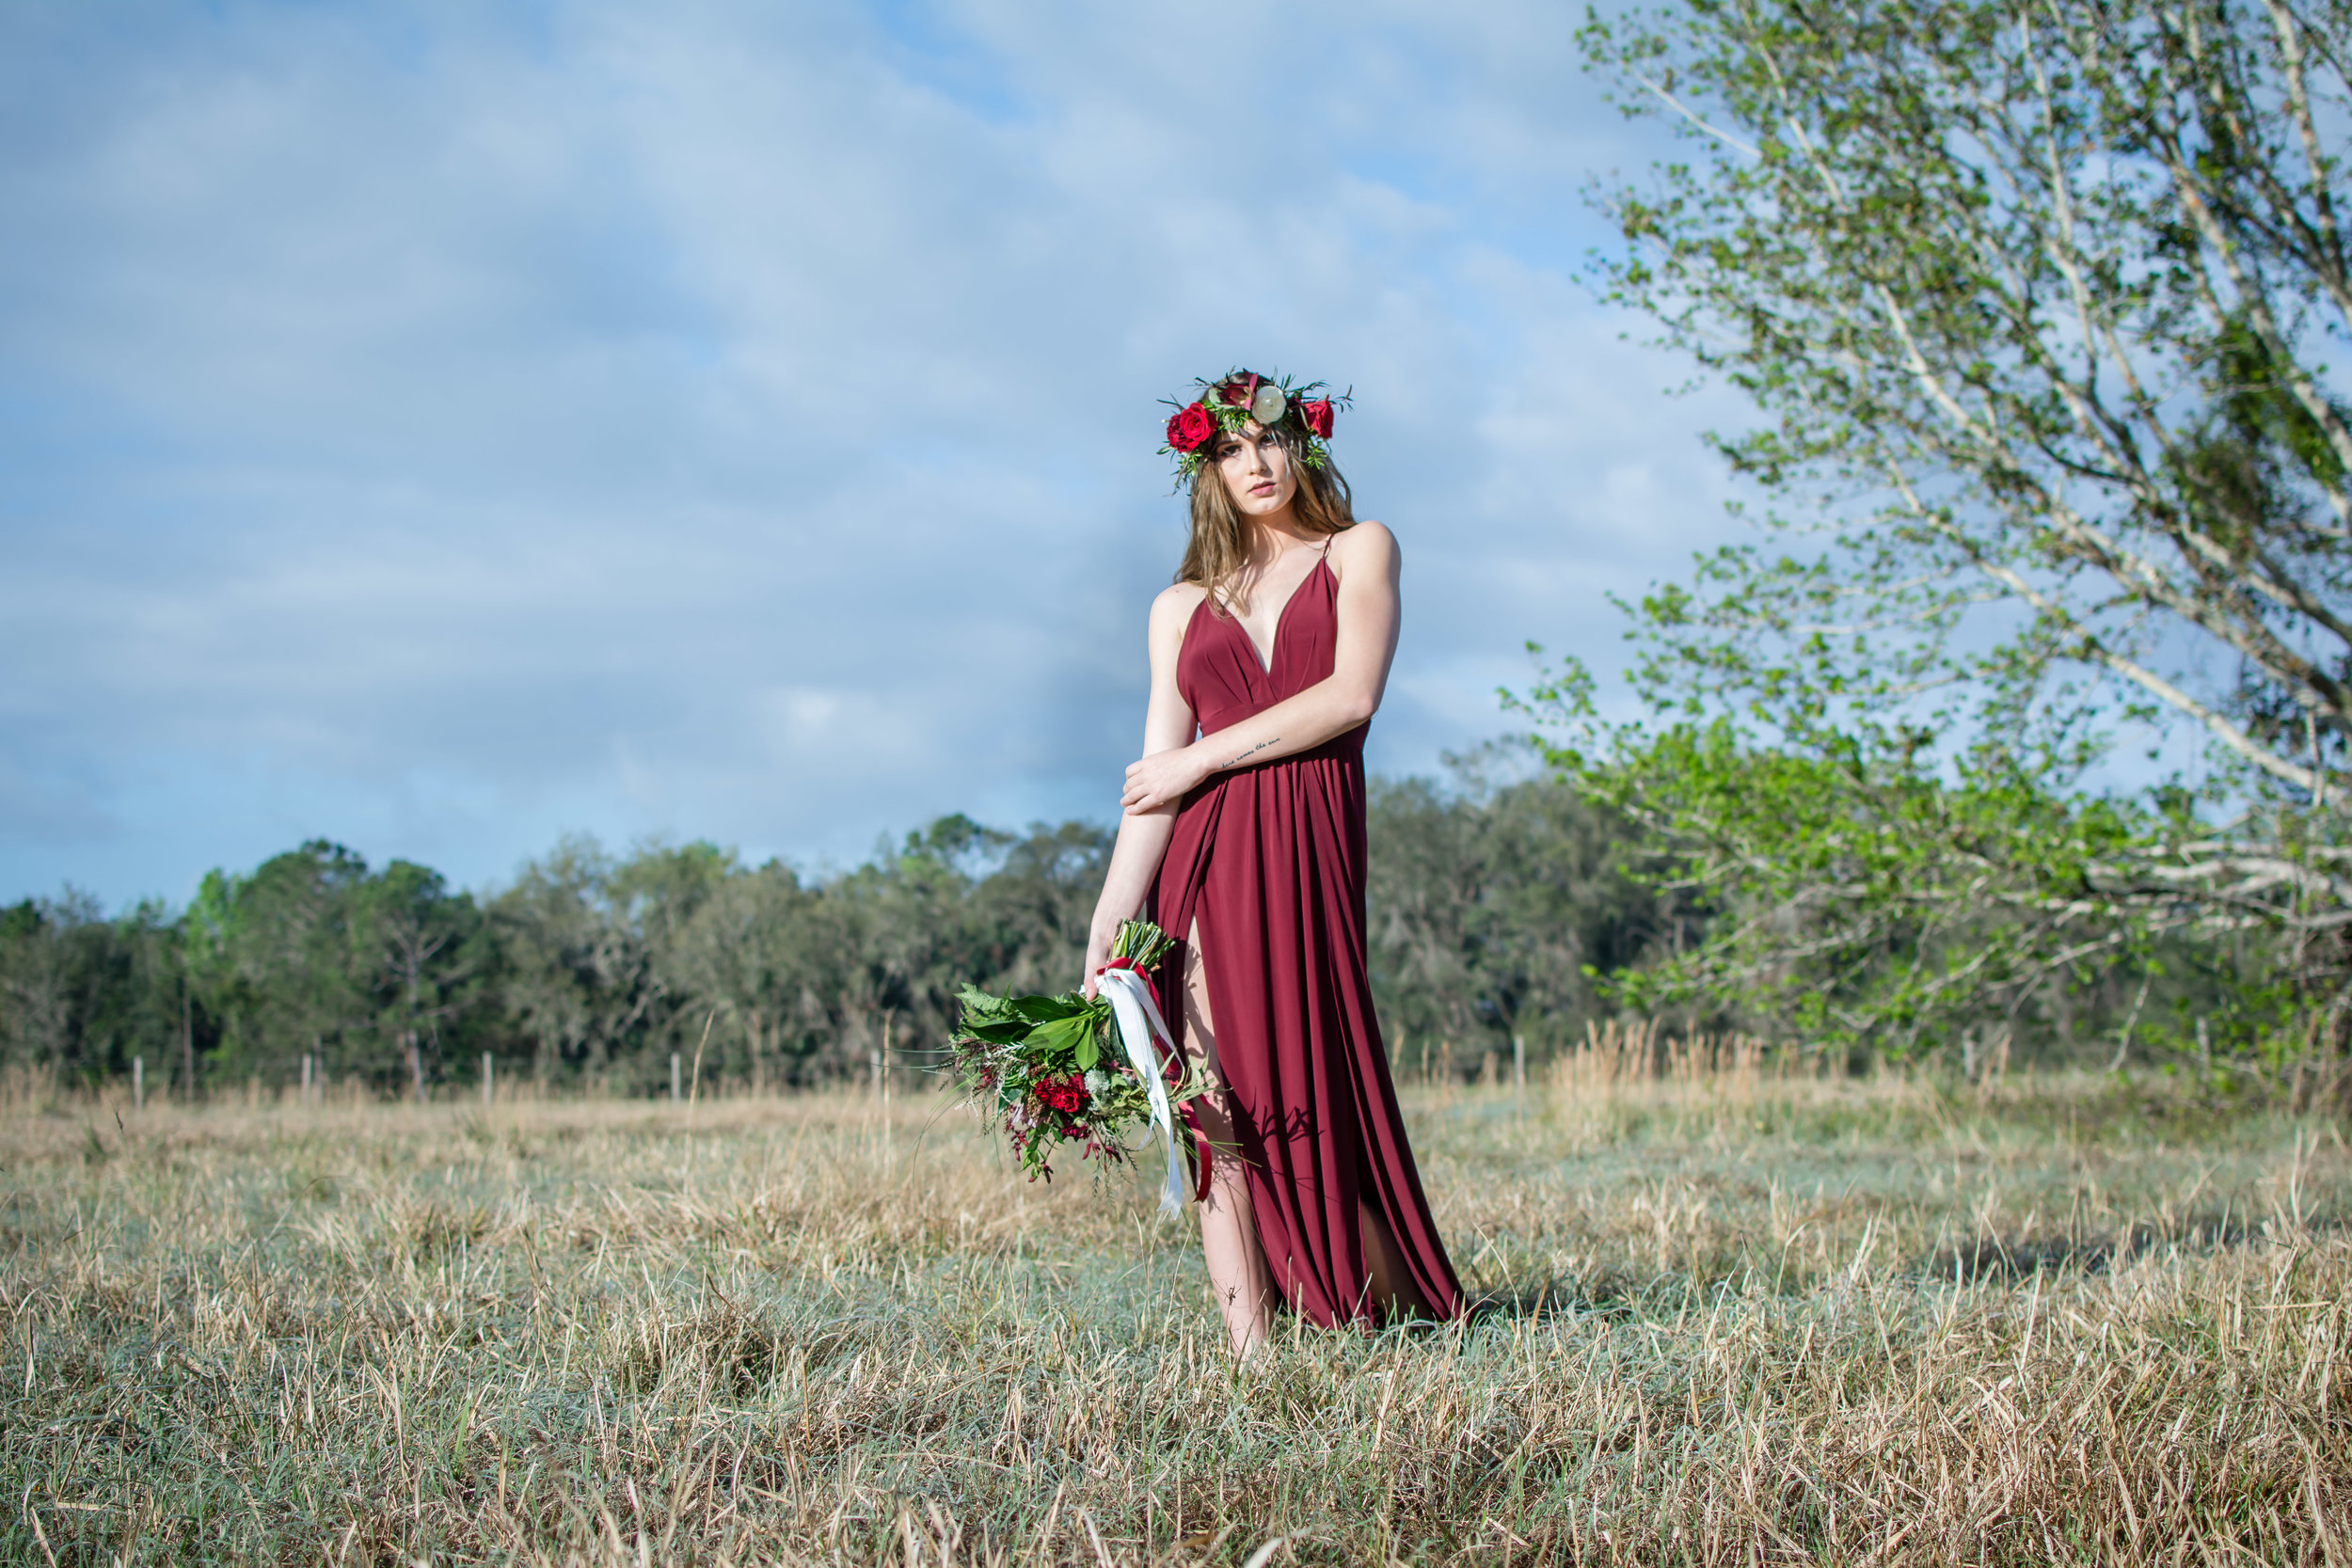 whimsical-bridal-inspiration-fashion-photoshoot-geneva-photographer-yanitza-ninett-1-4.jpg